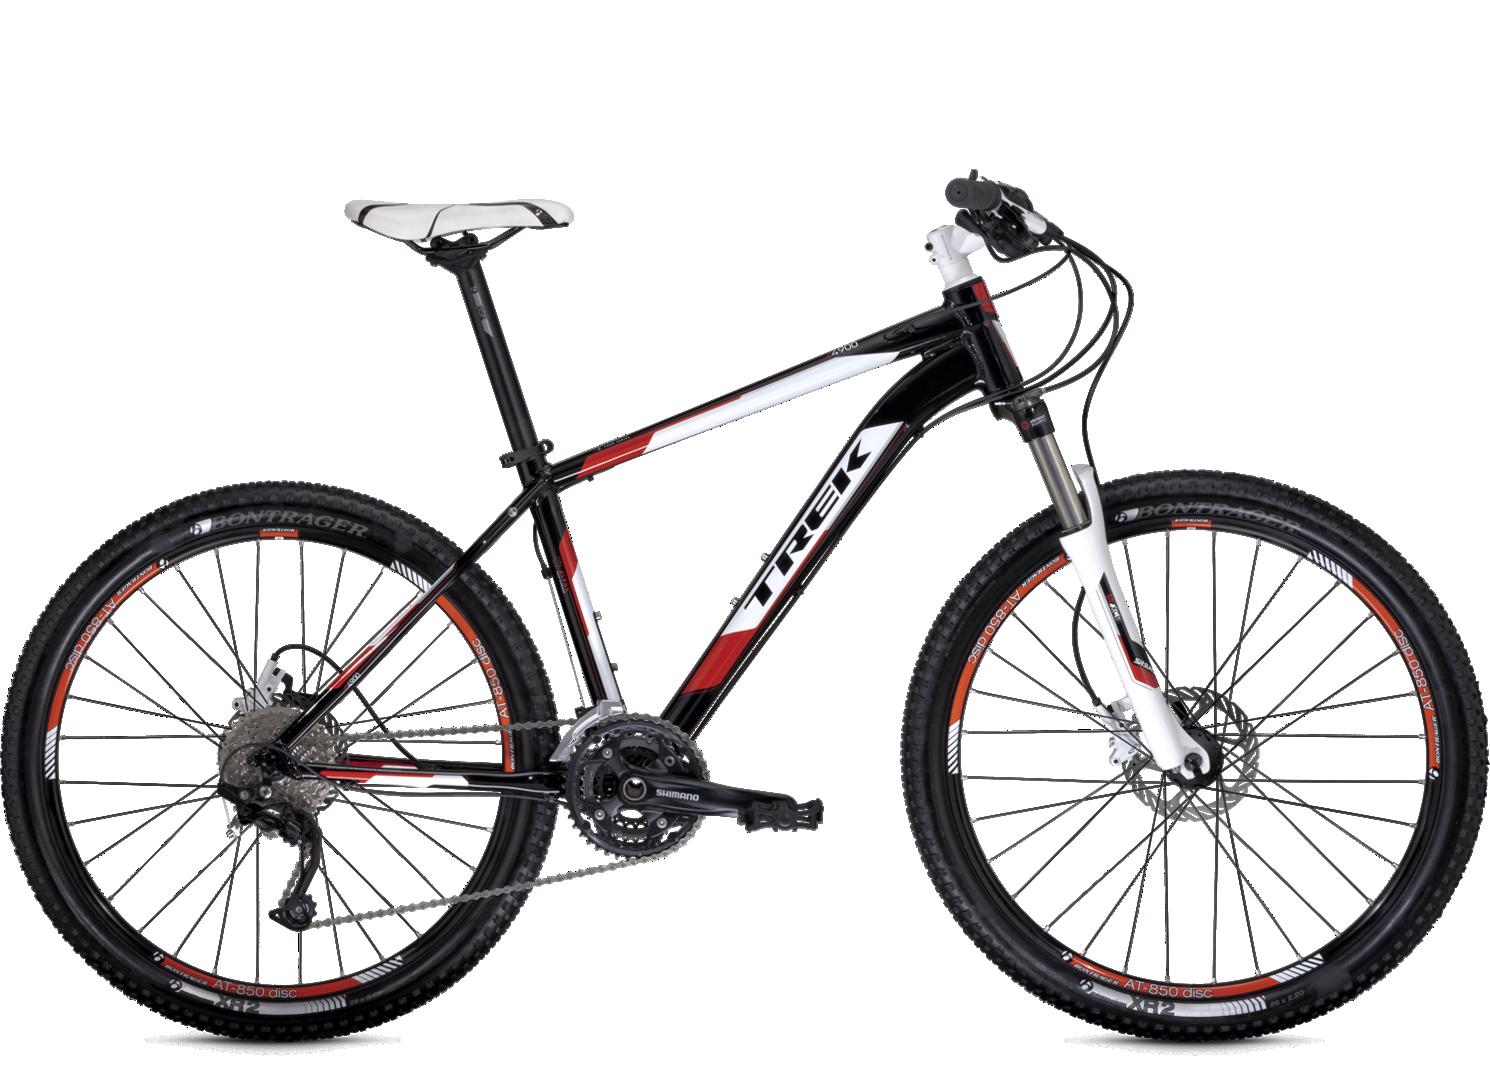 4149d64e6d8 2013 4900 Disc - Bike Archive - Trek Bicycle